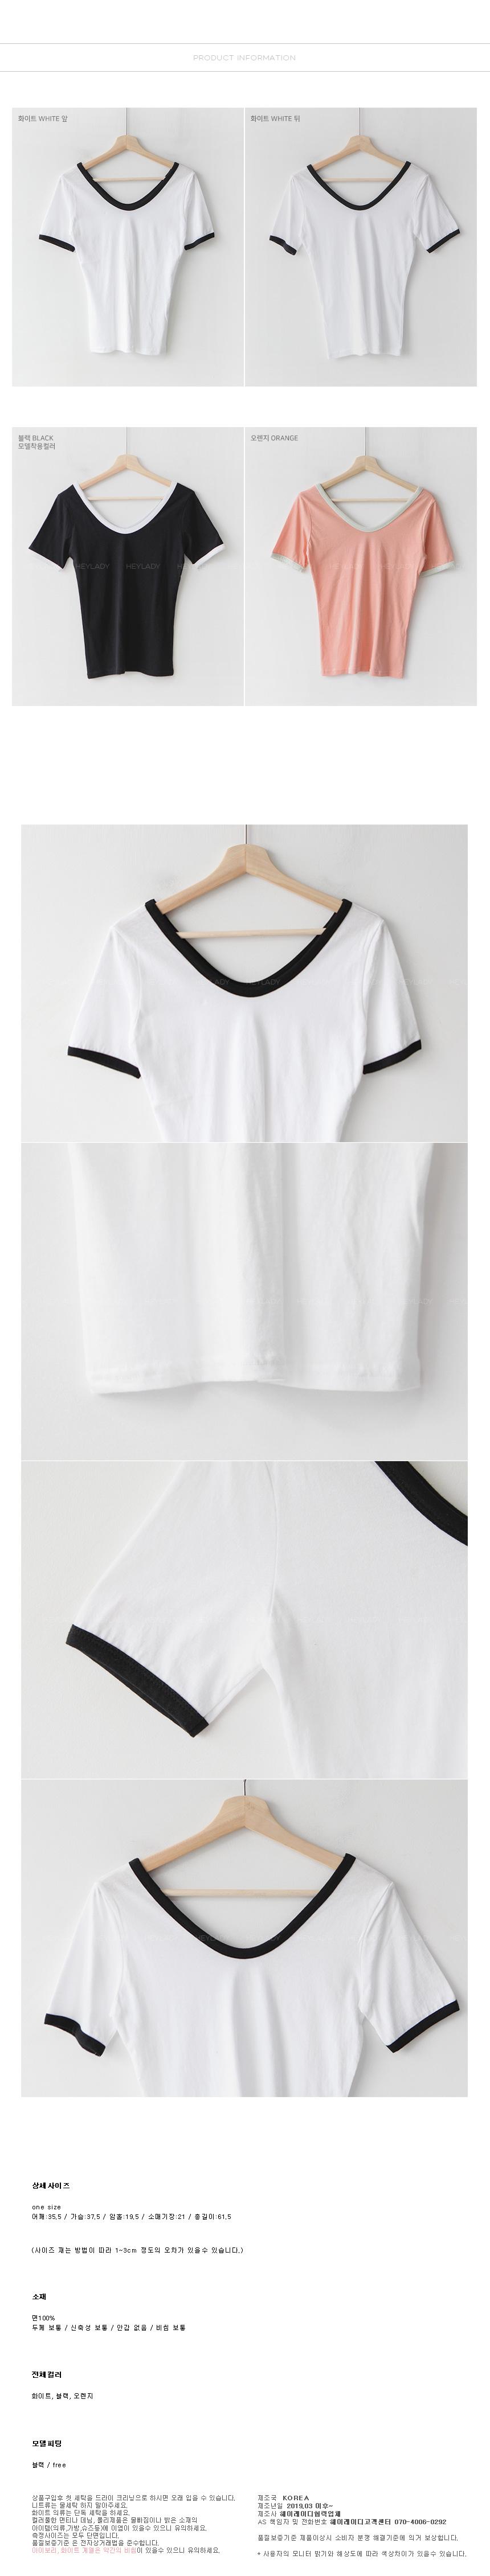 Marvel Rabb U-neck short-sleeved tee